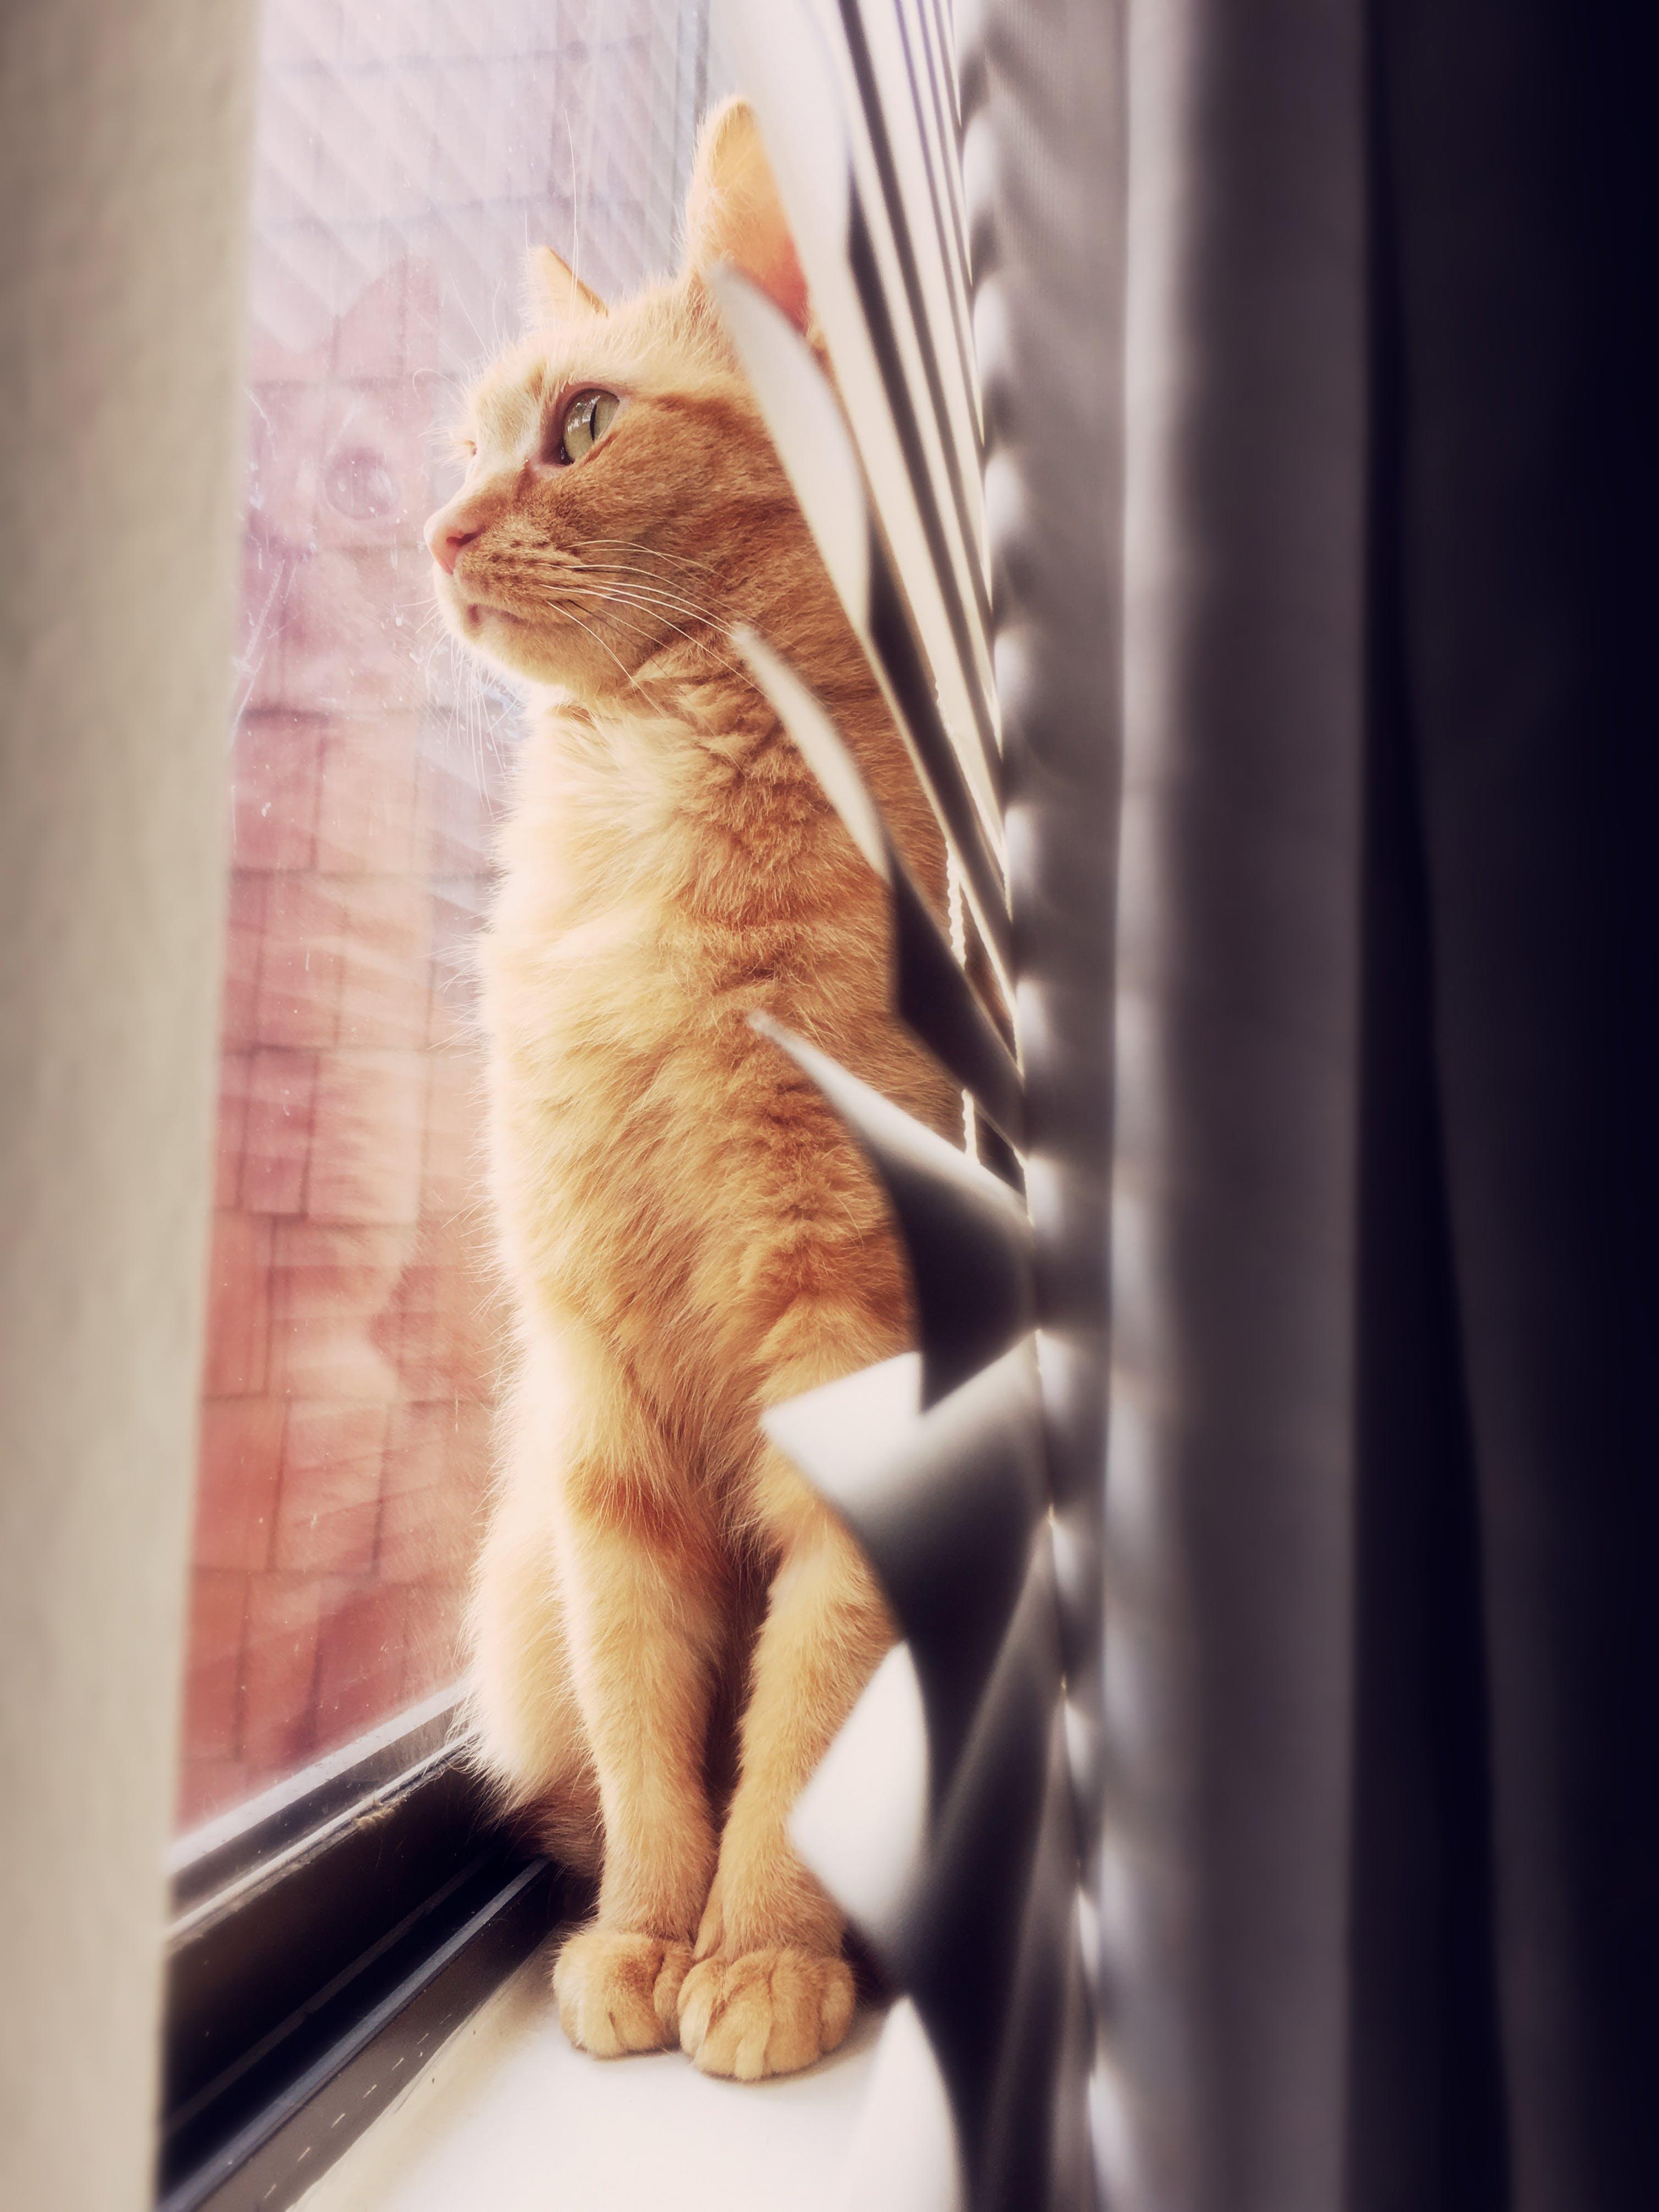 Free stock photo of cat, eye glasses, glass window, sad eyes